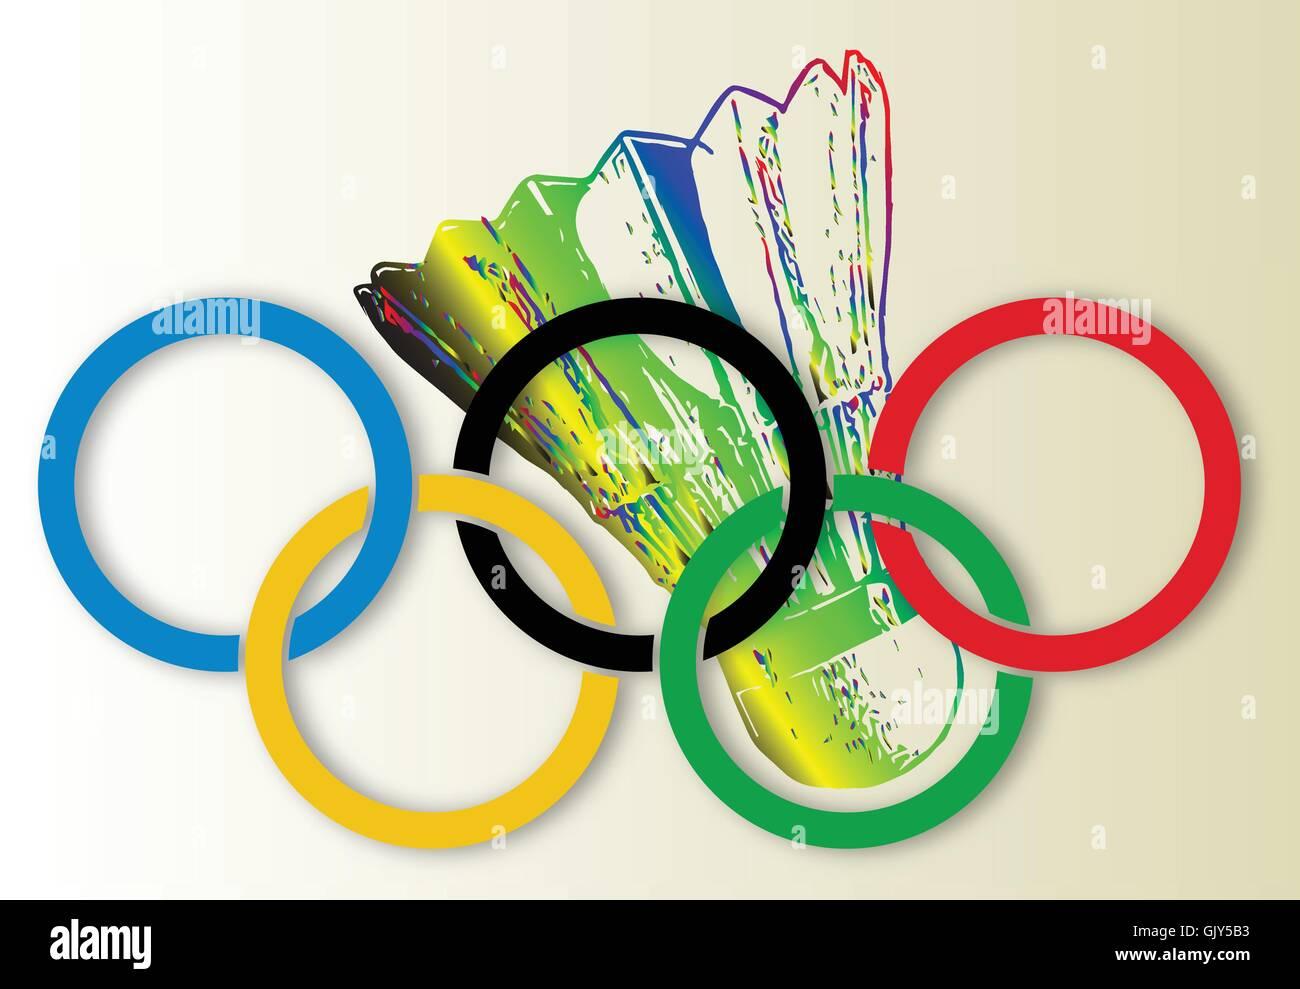 Olympic Badminton - Stock Vector